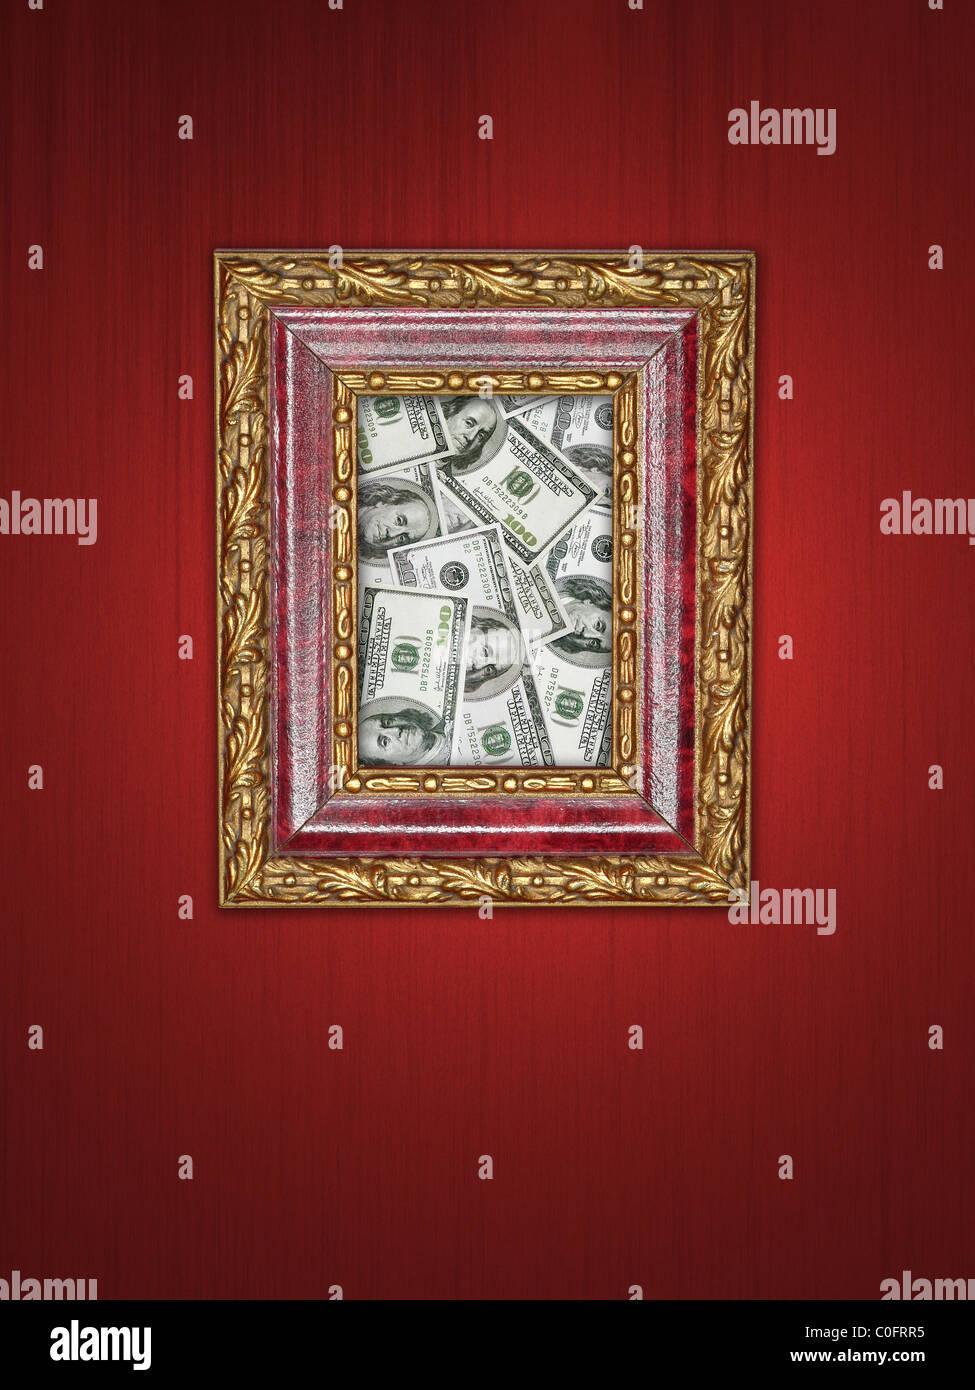 Haufen von hundert-Dollar-Banknoten in Holz Bilderrahmen mit goldenen Ornamenten an lila Wand hängen Stockbild